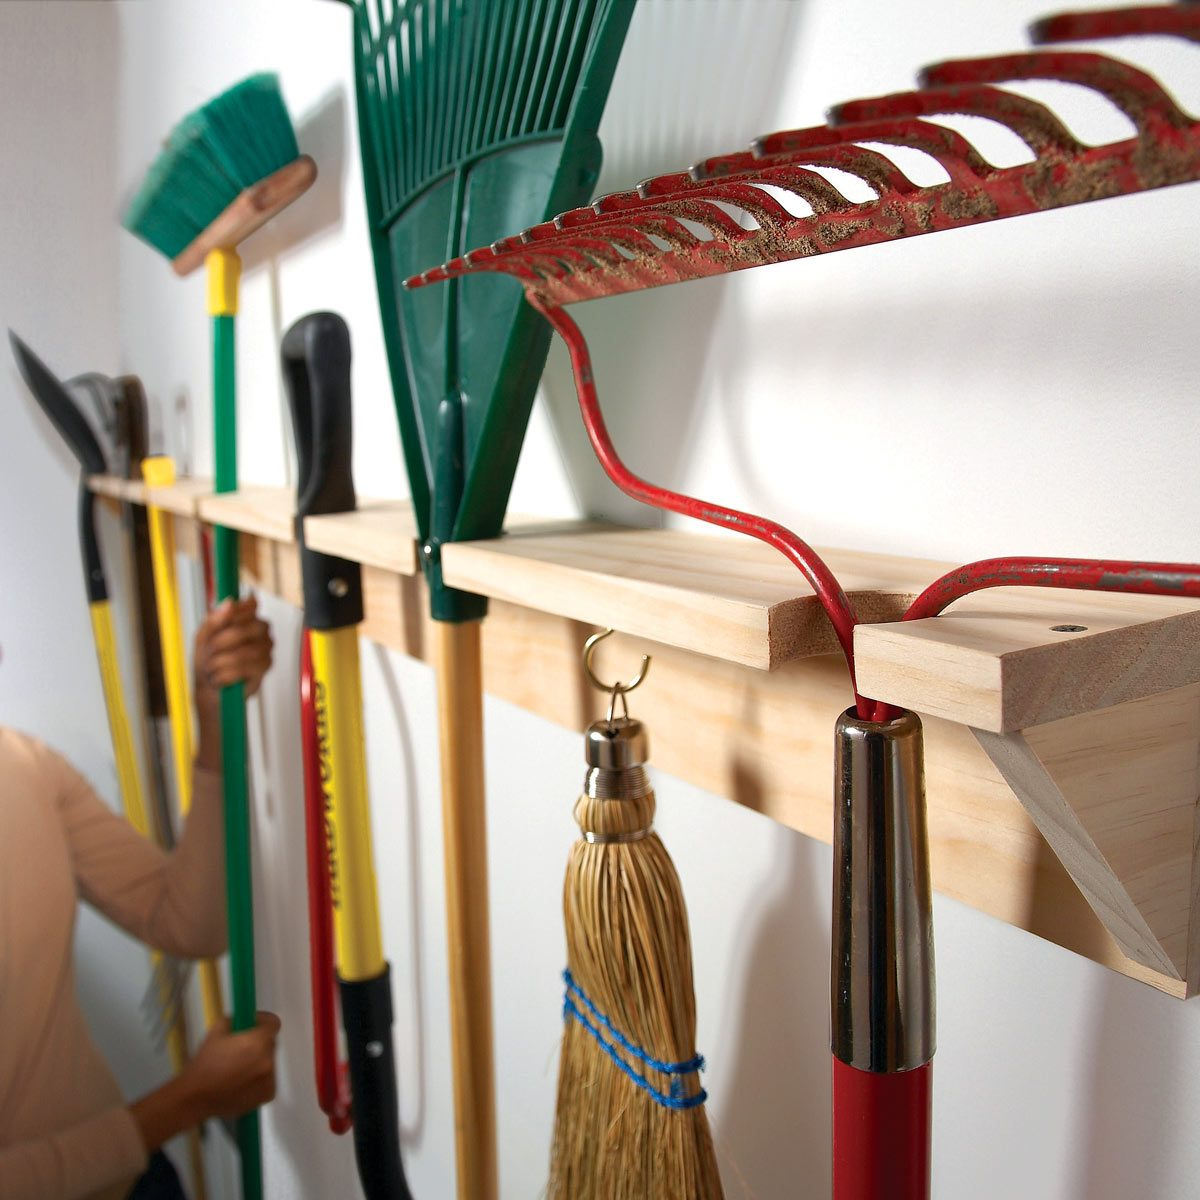 12 Ingenious Gardening And Yard Tool Storage Tips The Family